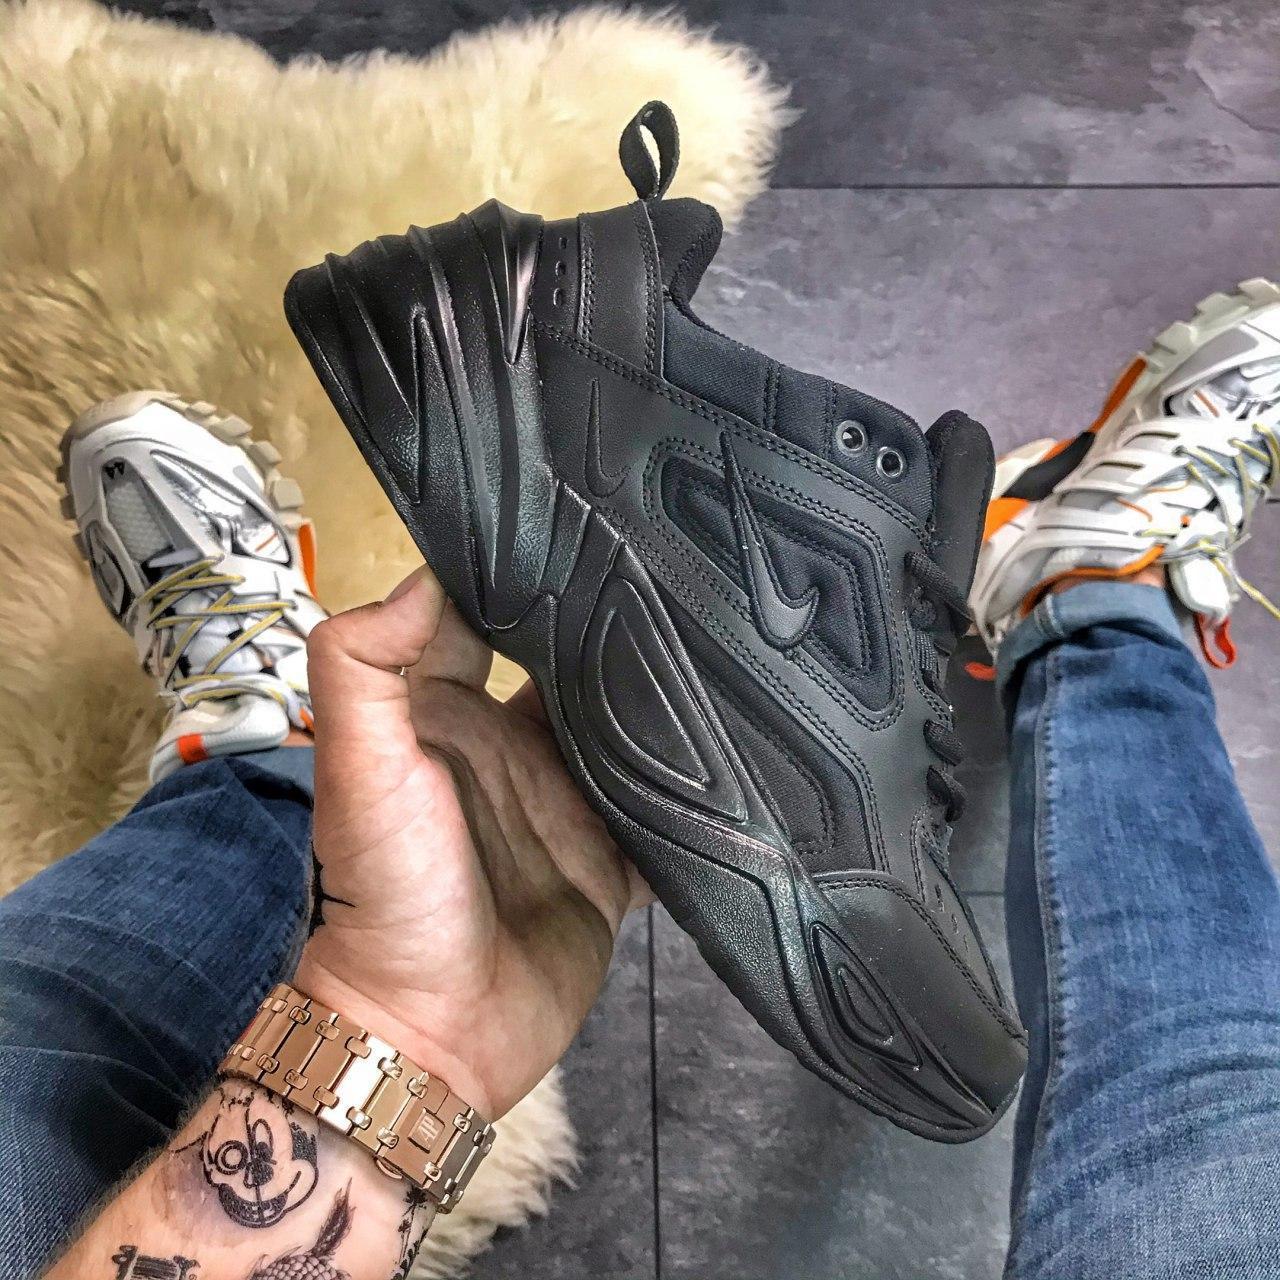 Кроссовки Nike M2K Tekno Найк М2К Текно кожа 🔥 Найк мужские кроссовки 🔥